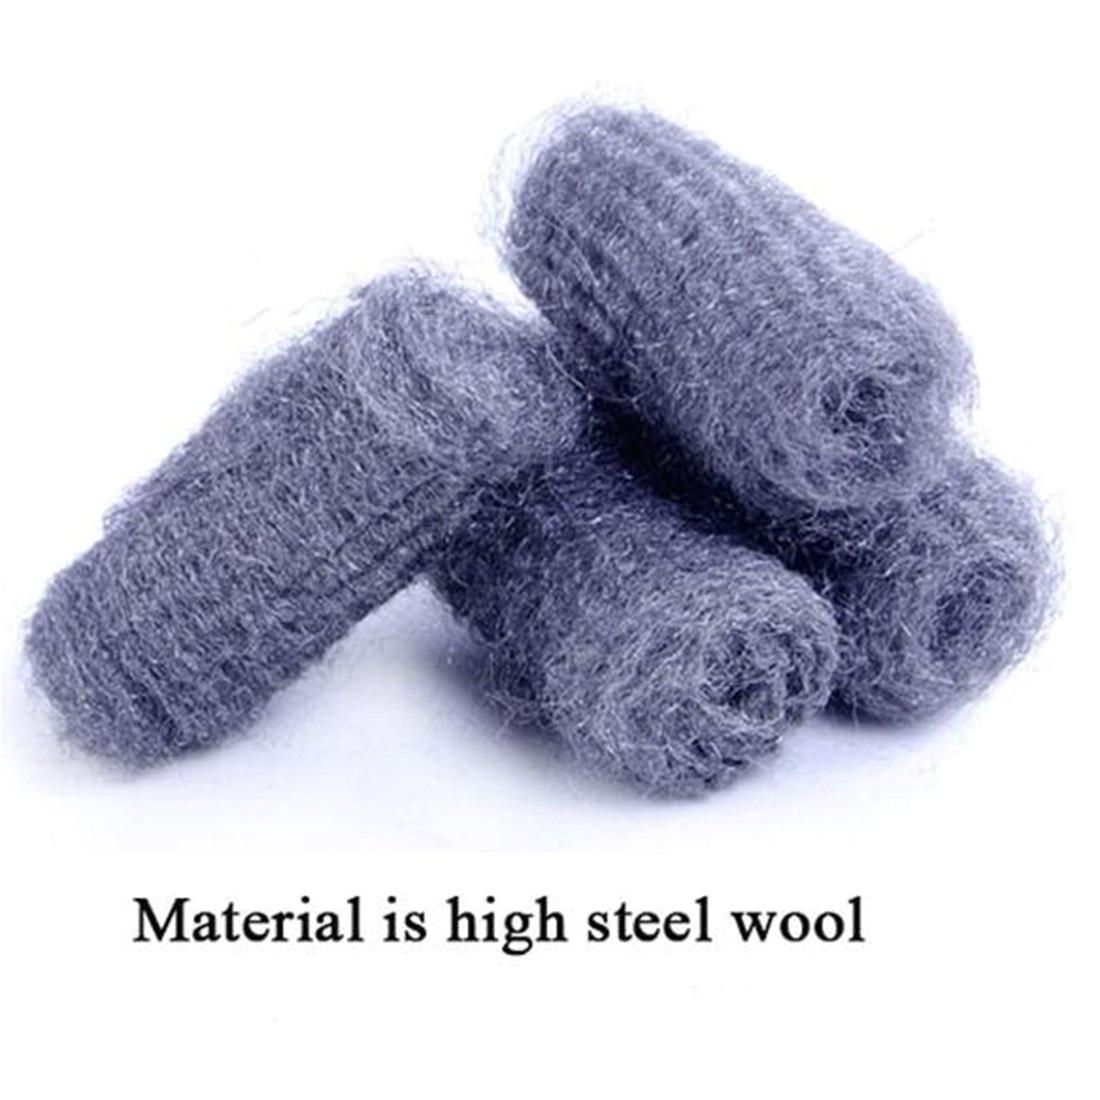 hot sale sponge metal mesh super detergent tool 12pcs lot kitchen steel wool degreasing cleaning